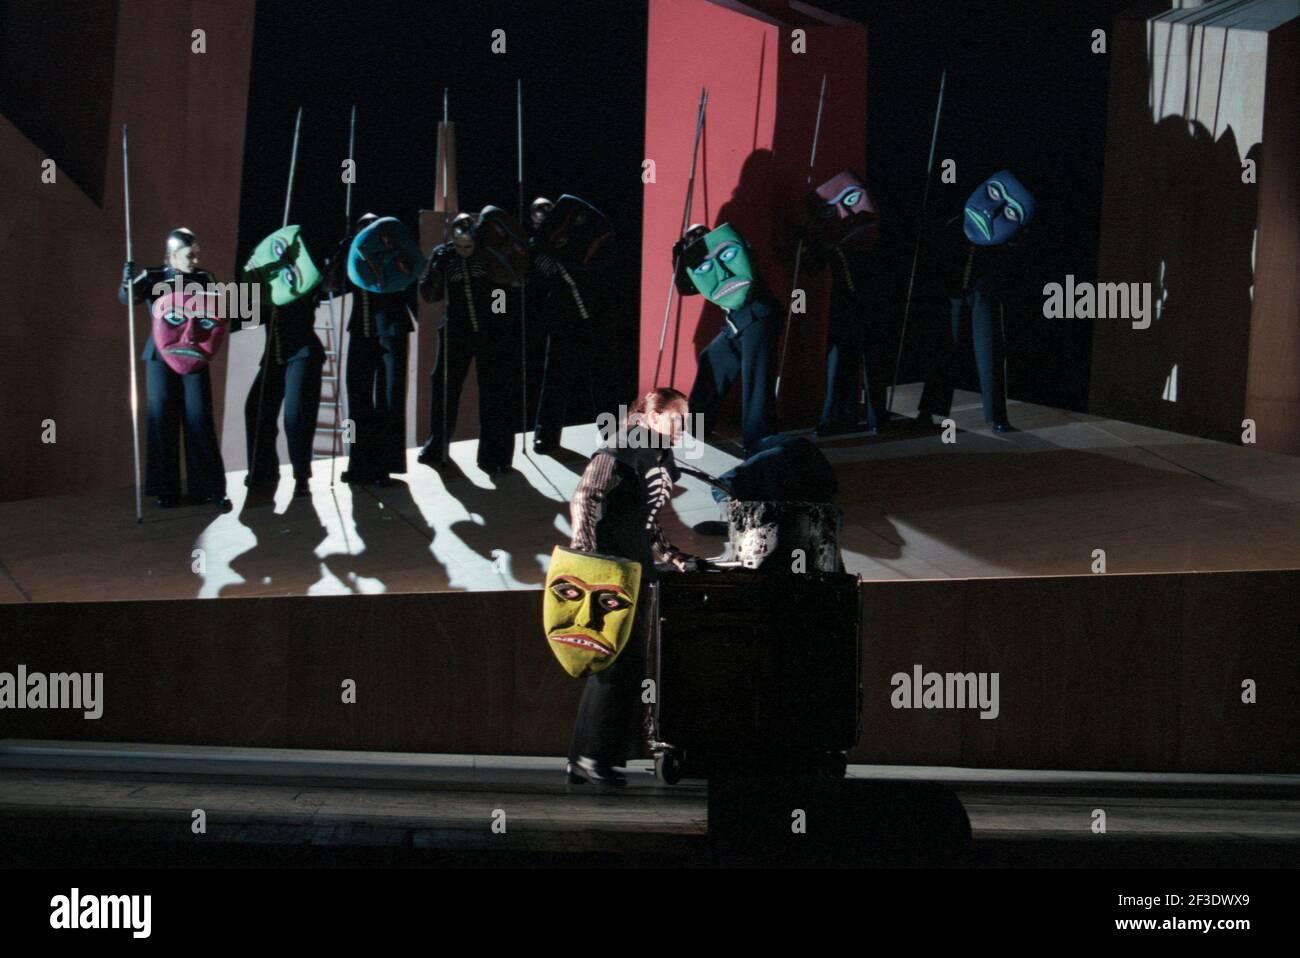 Deborah Polaski (Brunnhilde) with Valkyries in DIE WALKURE by Wagner at the The Royal Opera, Covent Garden, London WC2  30/09/1996  conductor: Bernard Haitink  design: Nigel Lowery  lighting: Pat Collins  director: Richard Jones Stock Photo